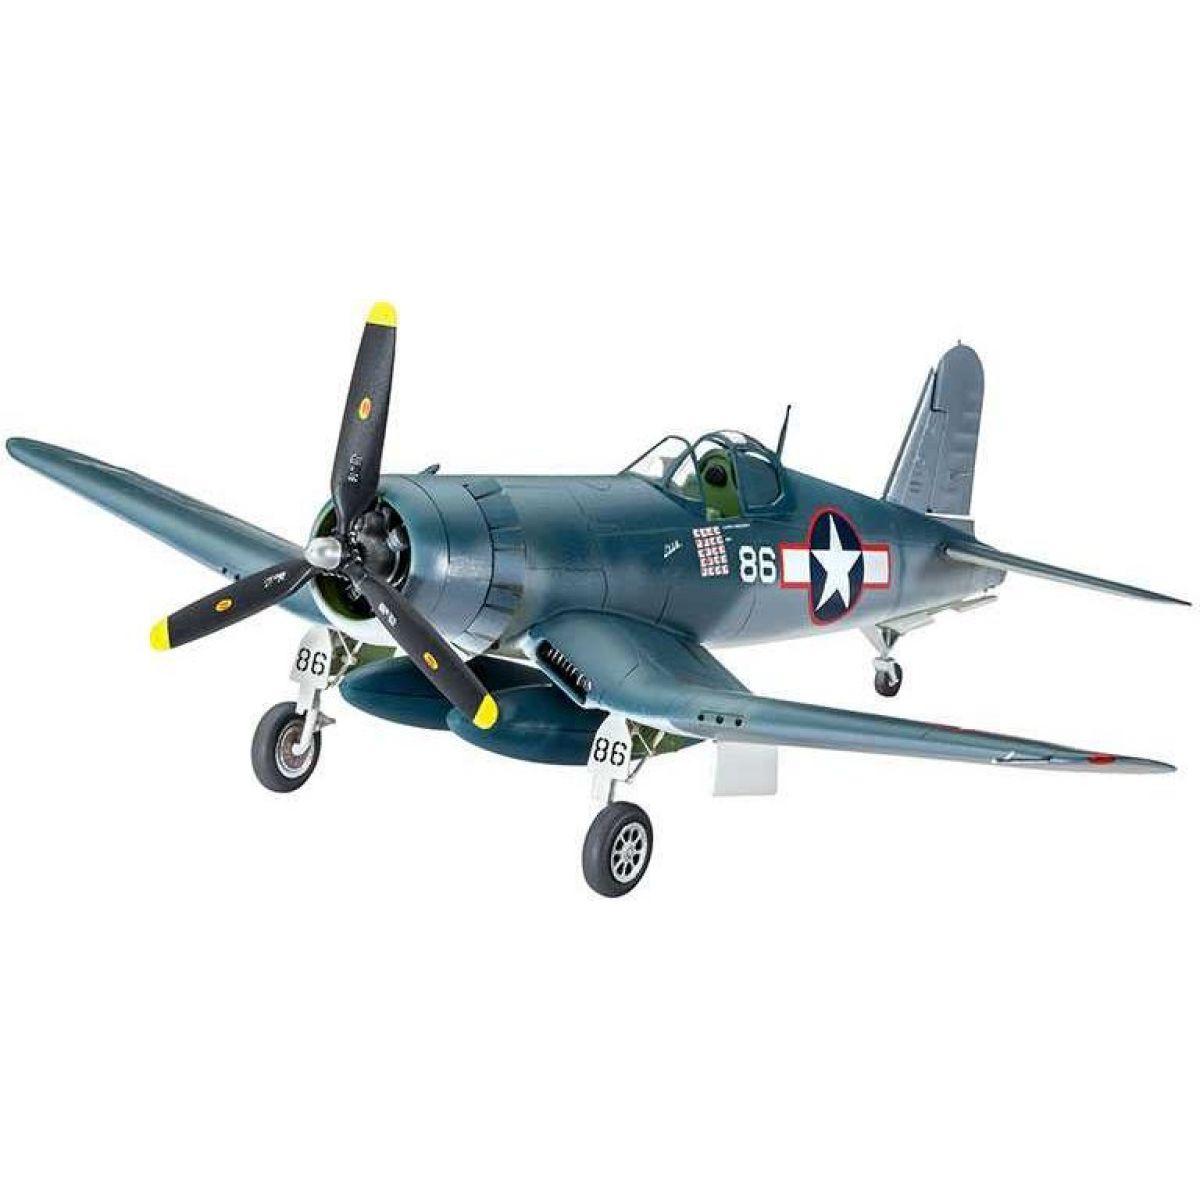 Revell ModelSet letadlo Vought F4U-1A Corsair 1:72